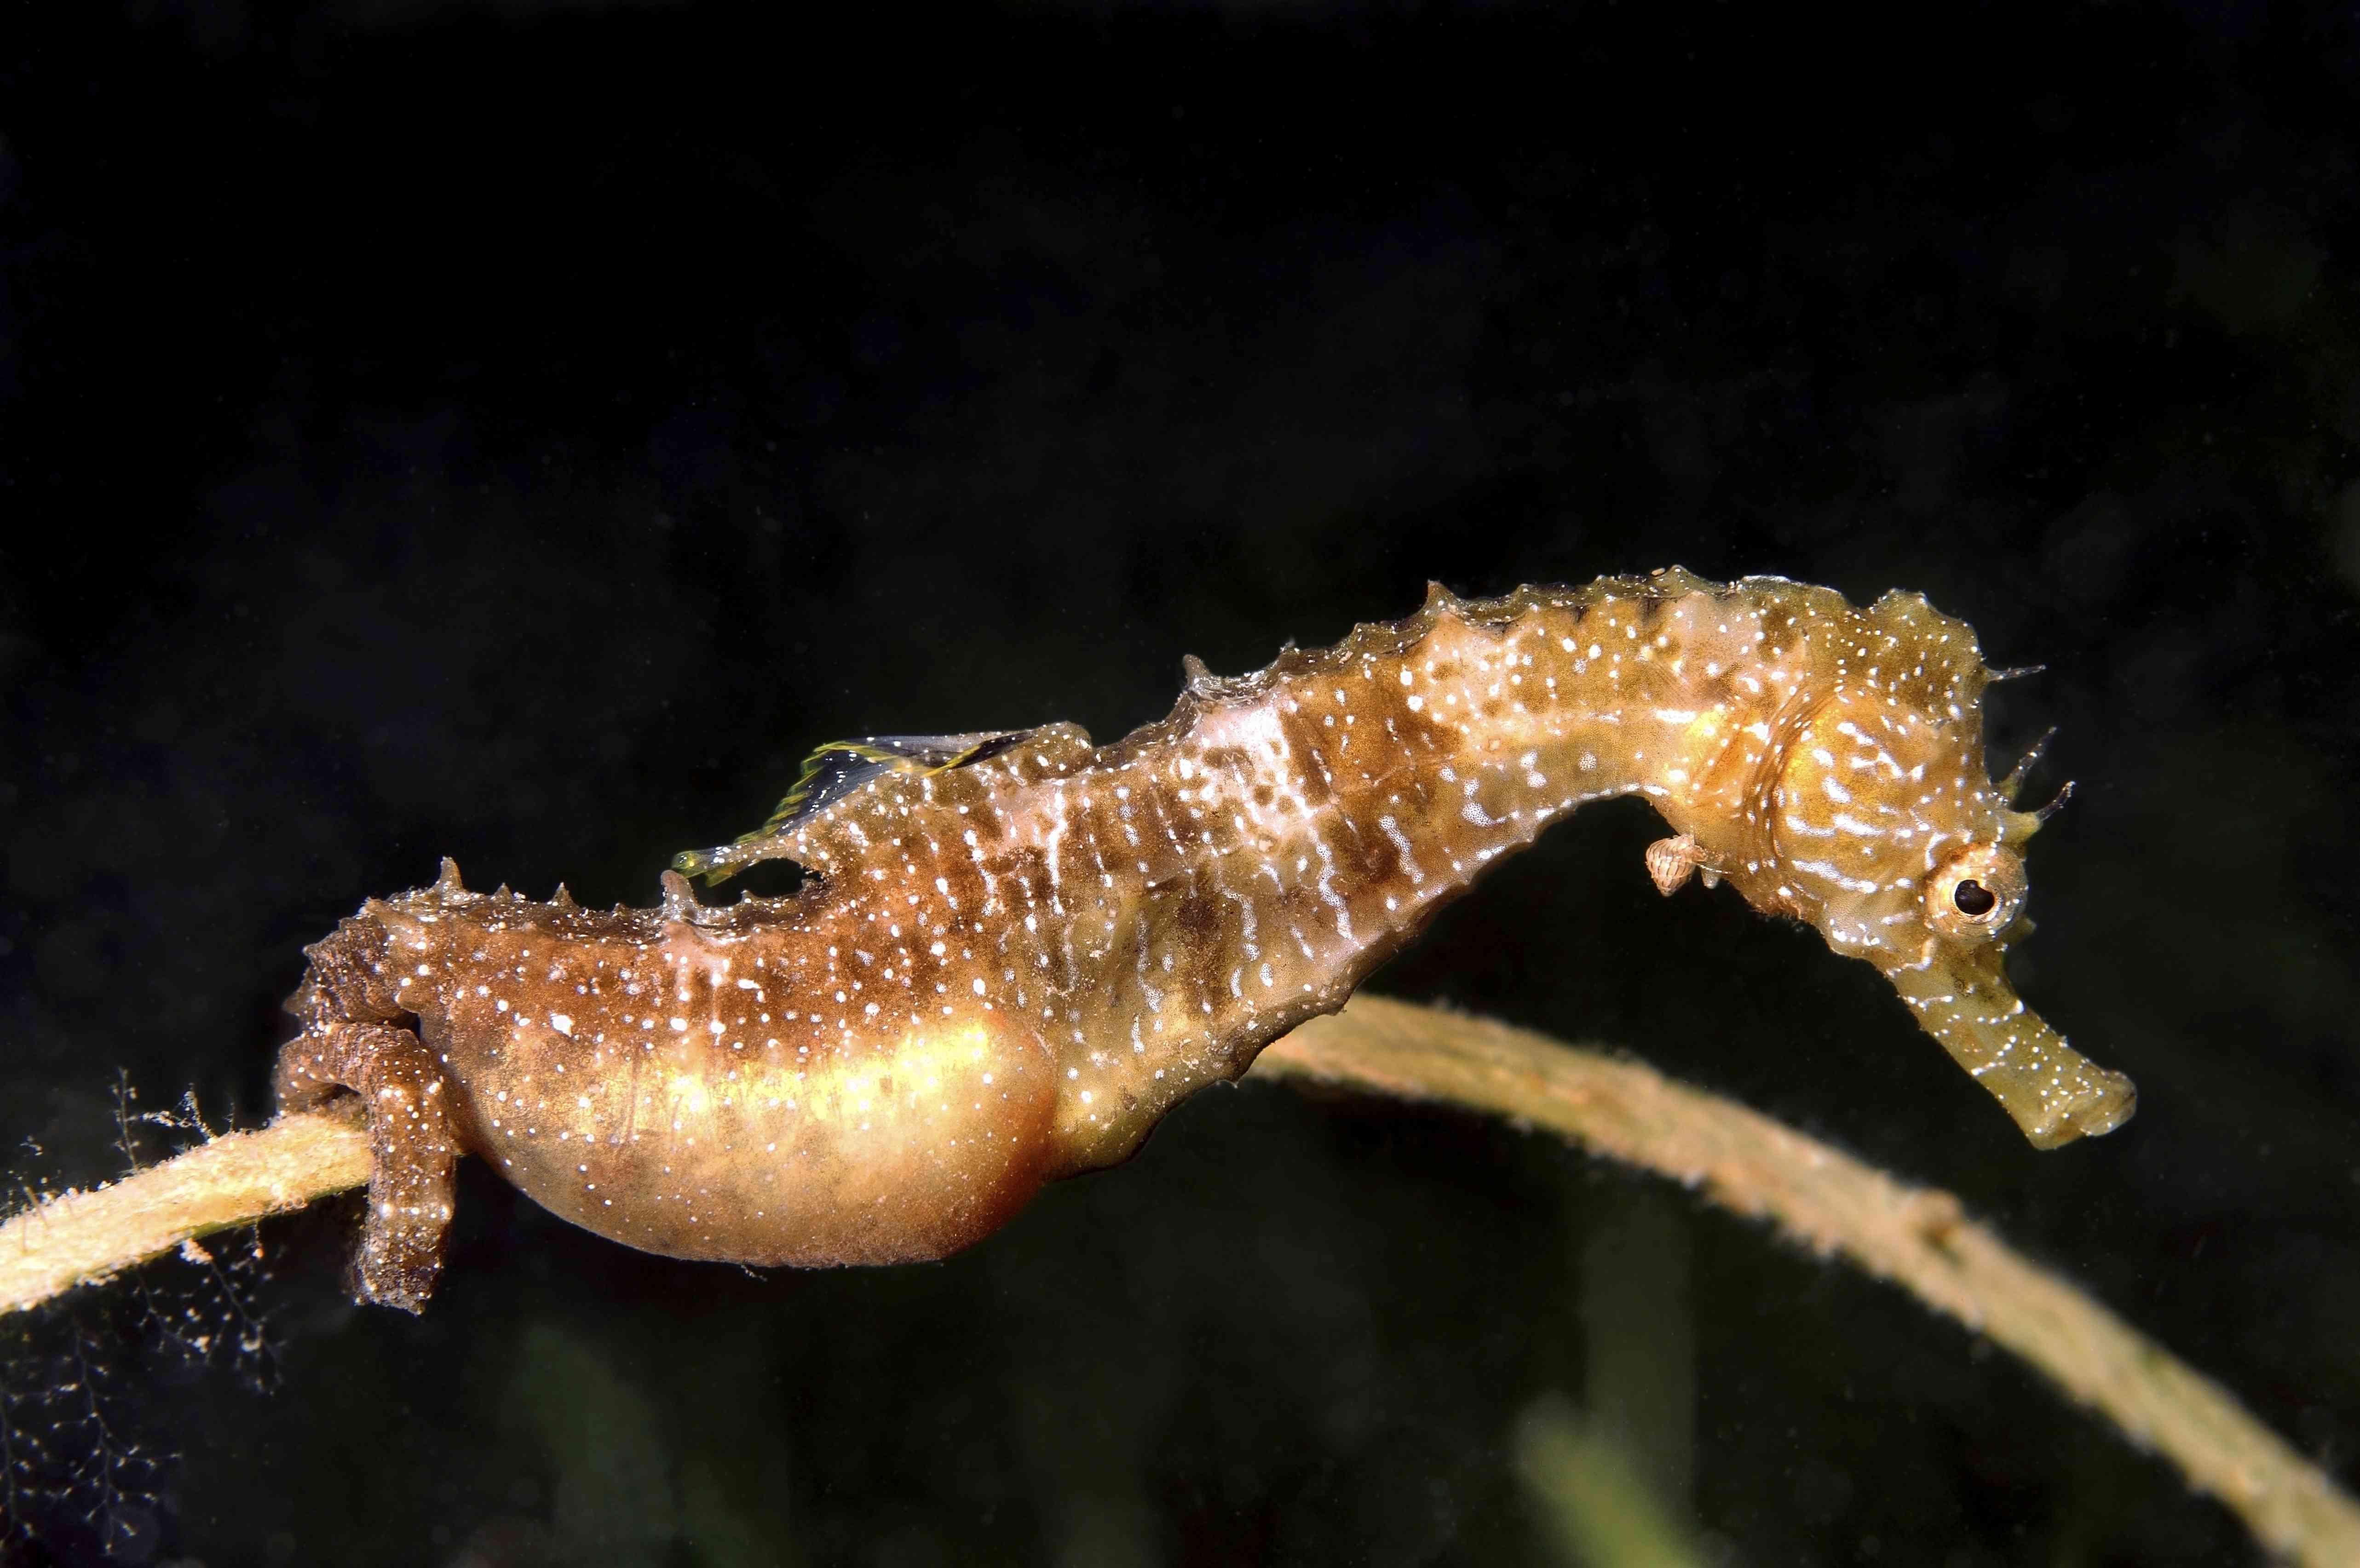 Short-snouted Seahorse -Hippocampus hippocampus-, male with eggs, Black Sea, Crimea, Ukraine